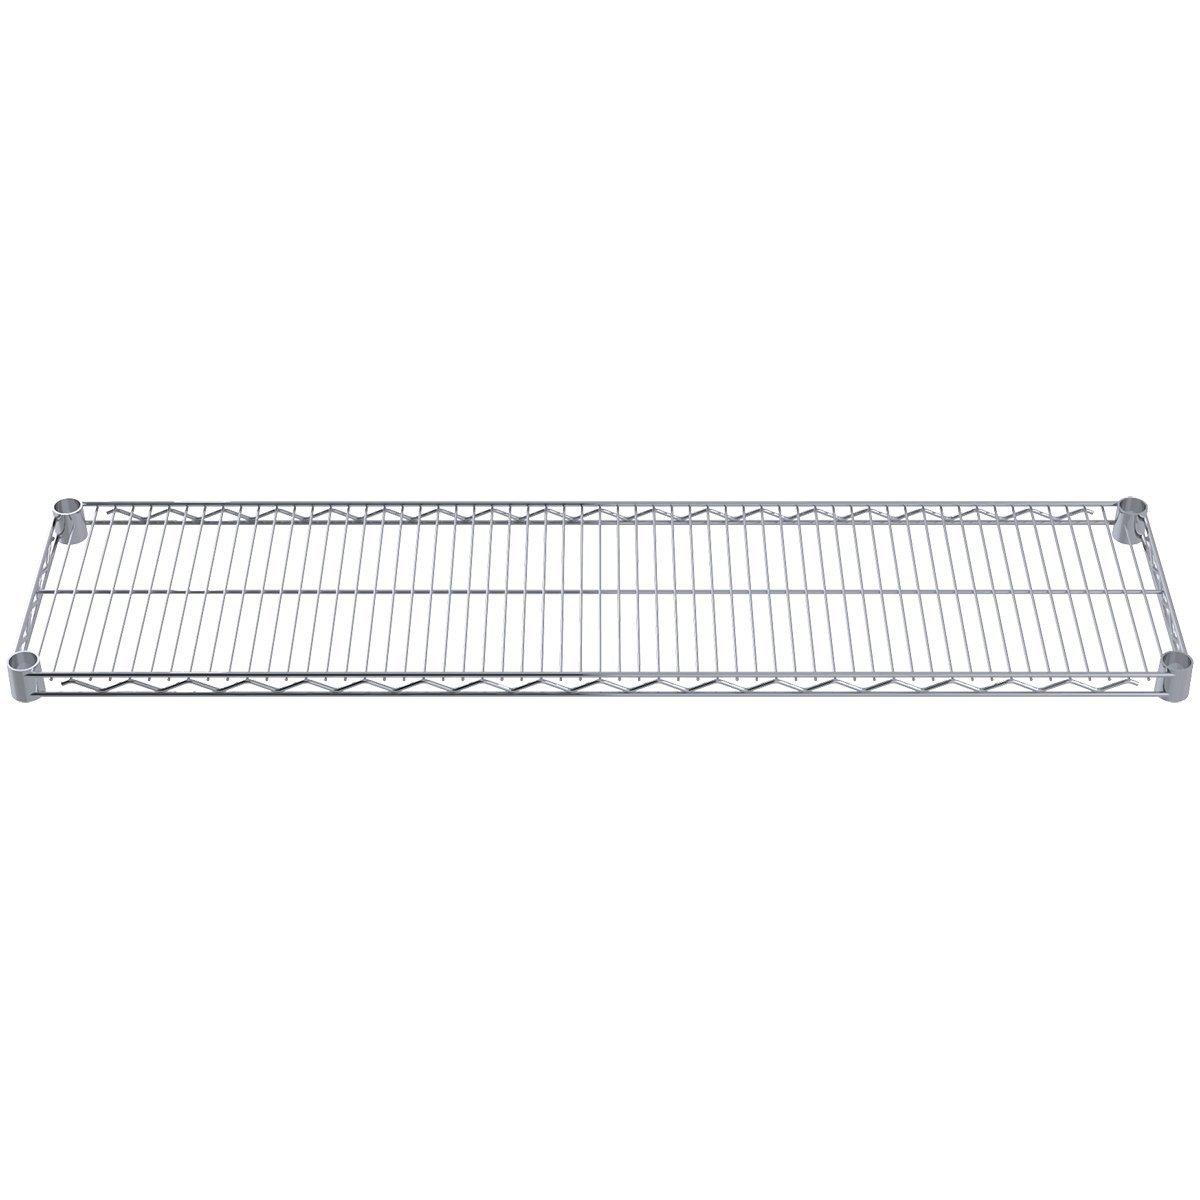 Akro-Mils AWS1248SHELF 12-Inch X 48-Inch NSF Approved Industrial Grade Chrome Wire Shelf, 4-Pack